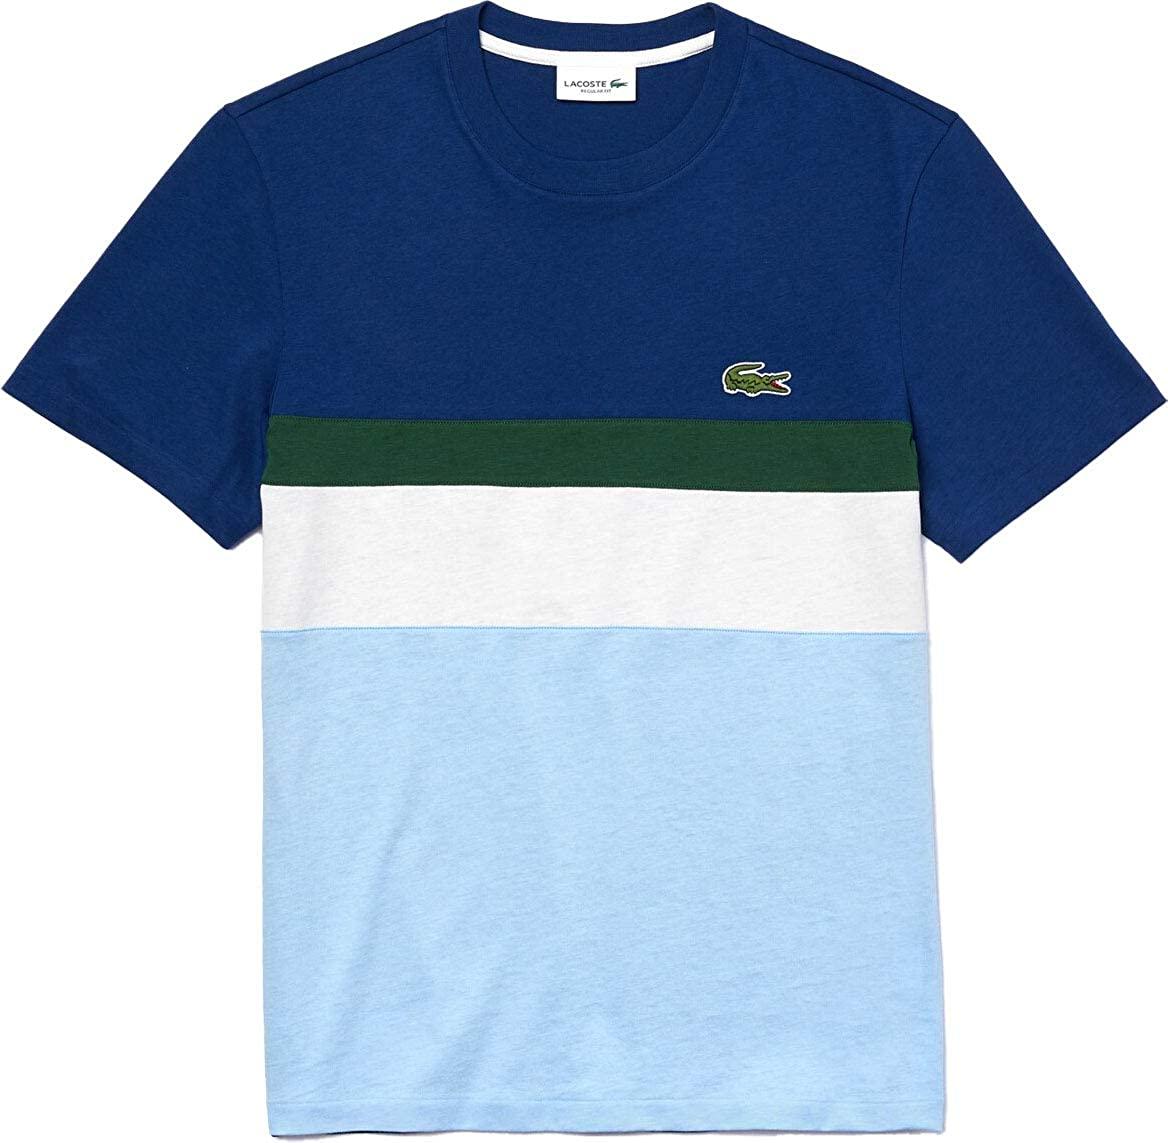 Lacoste Mens Short Sleeve Colorblocked Stripe T-Shirt